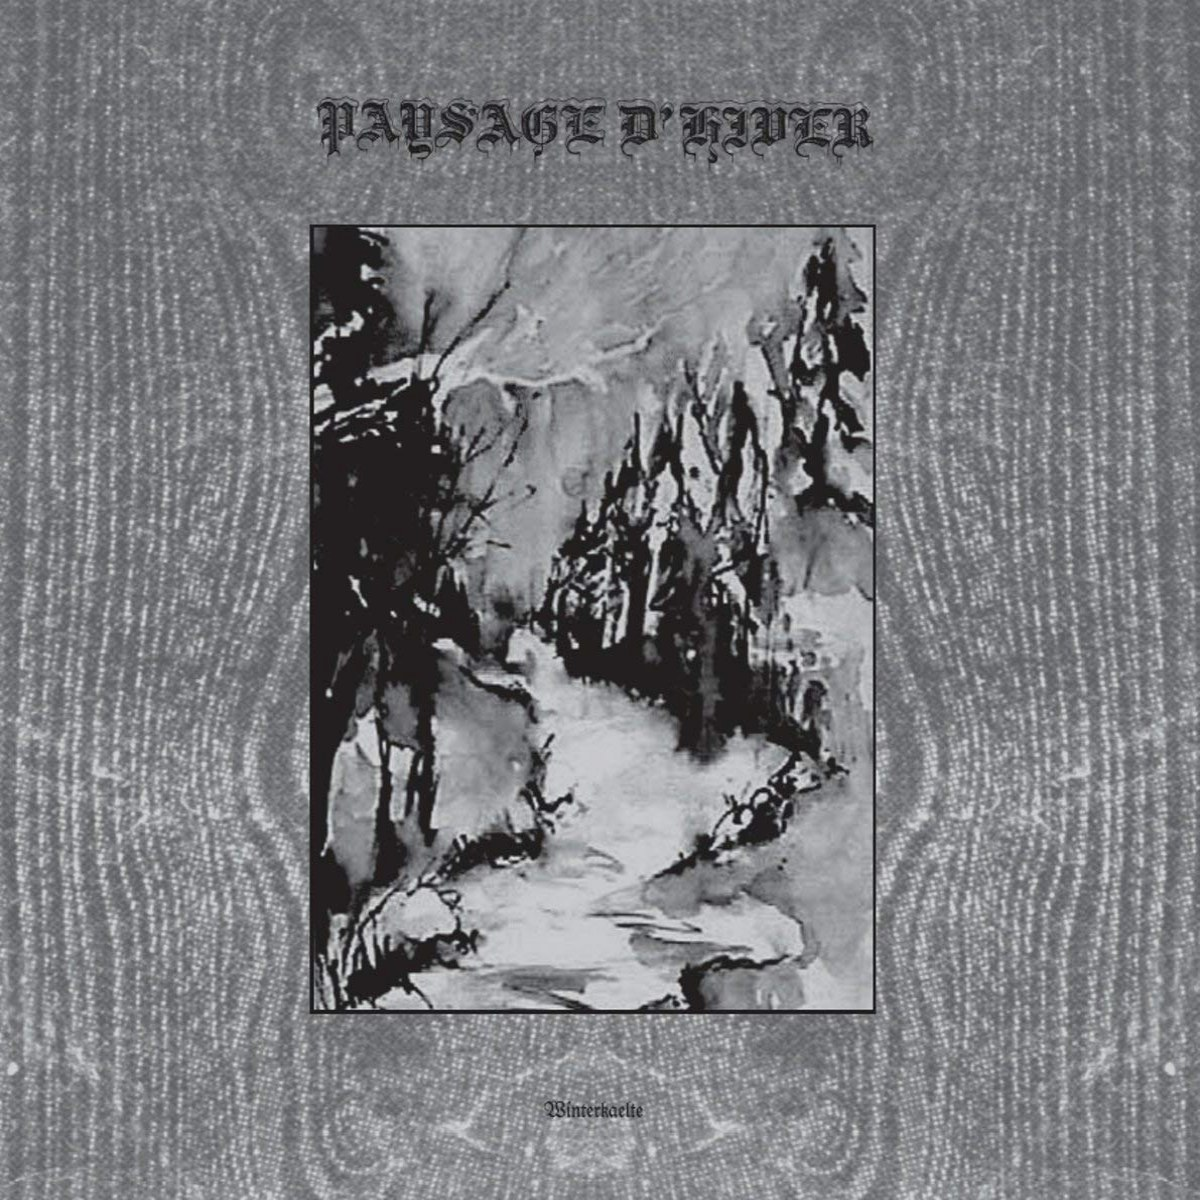 Reviews for Paysage d'Hiver - Winterkälte